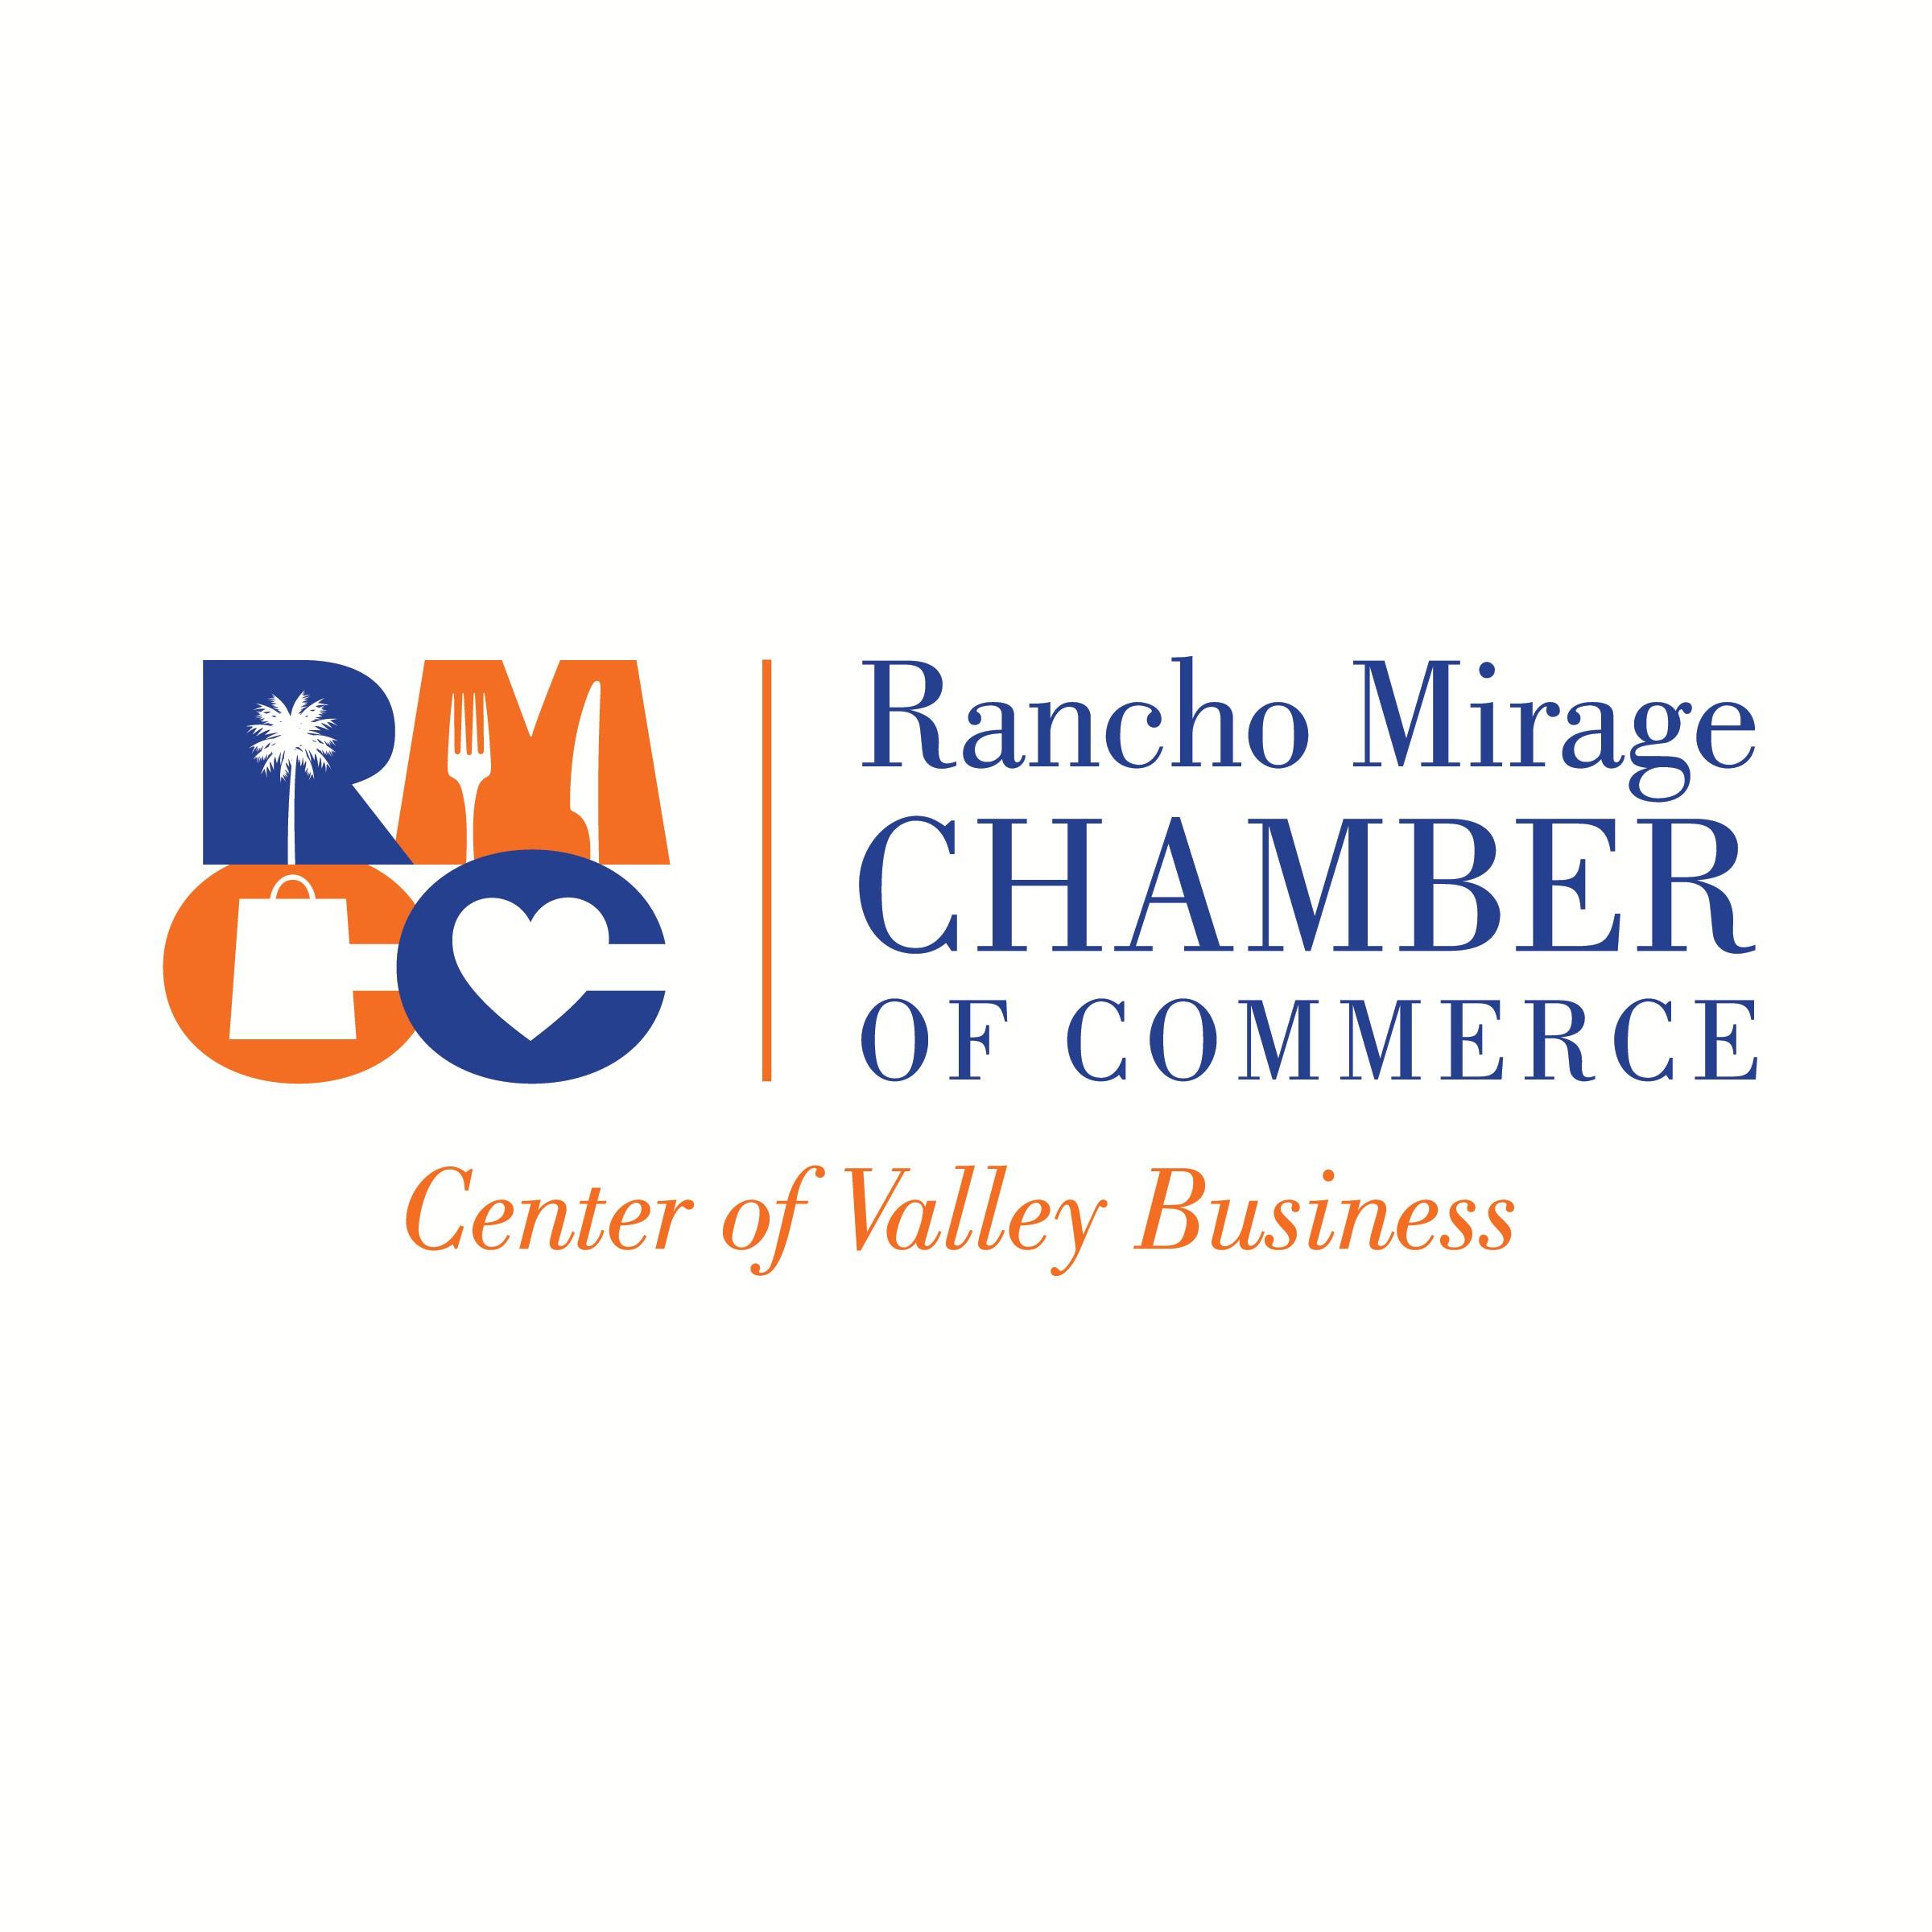 Rancho Mirage Chamber of Commerce | LinkedIn